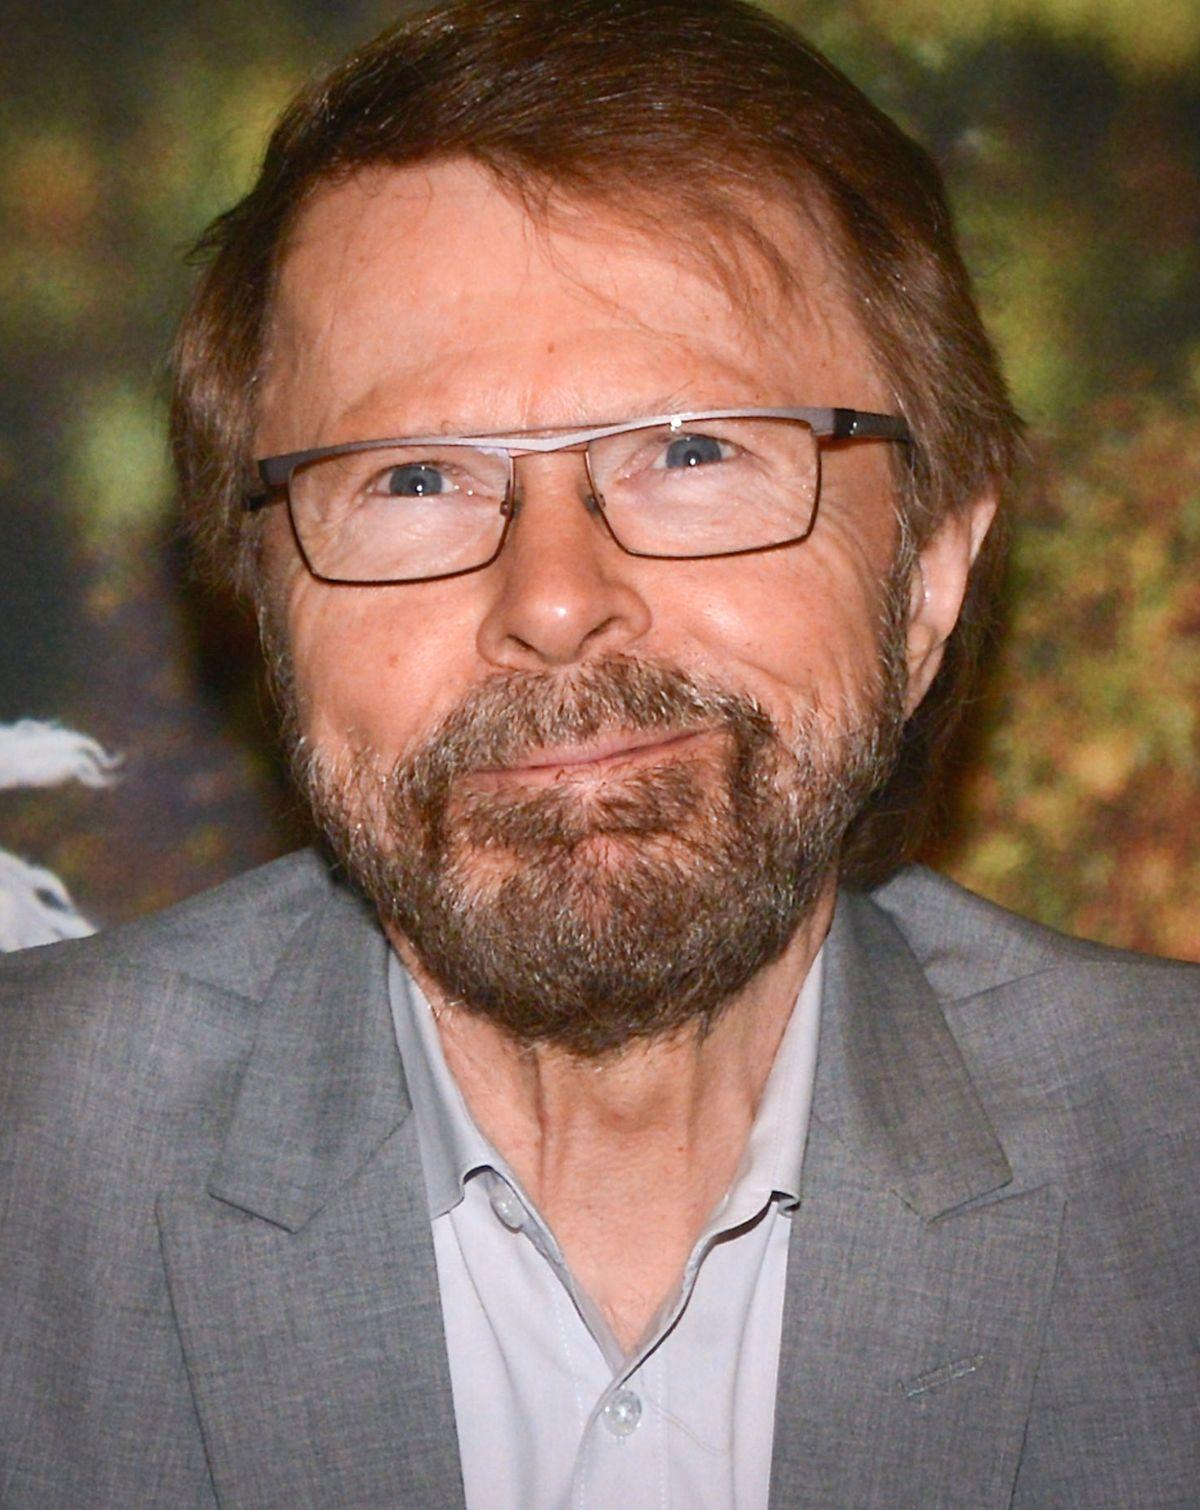 Björn Ulvaeus